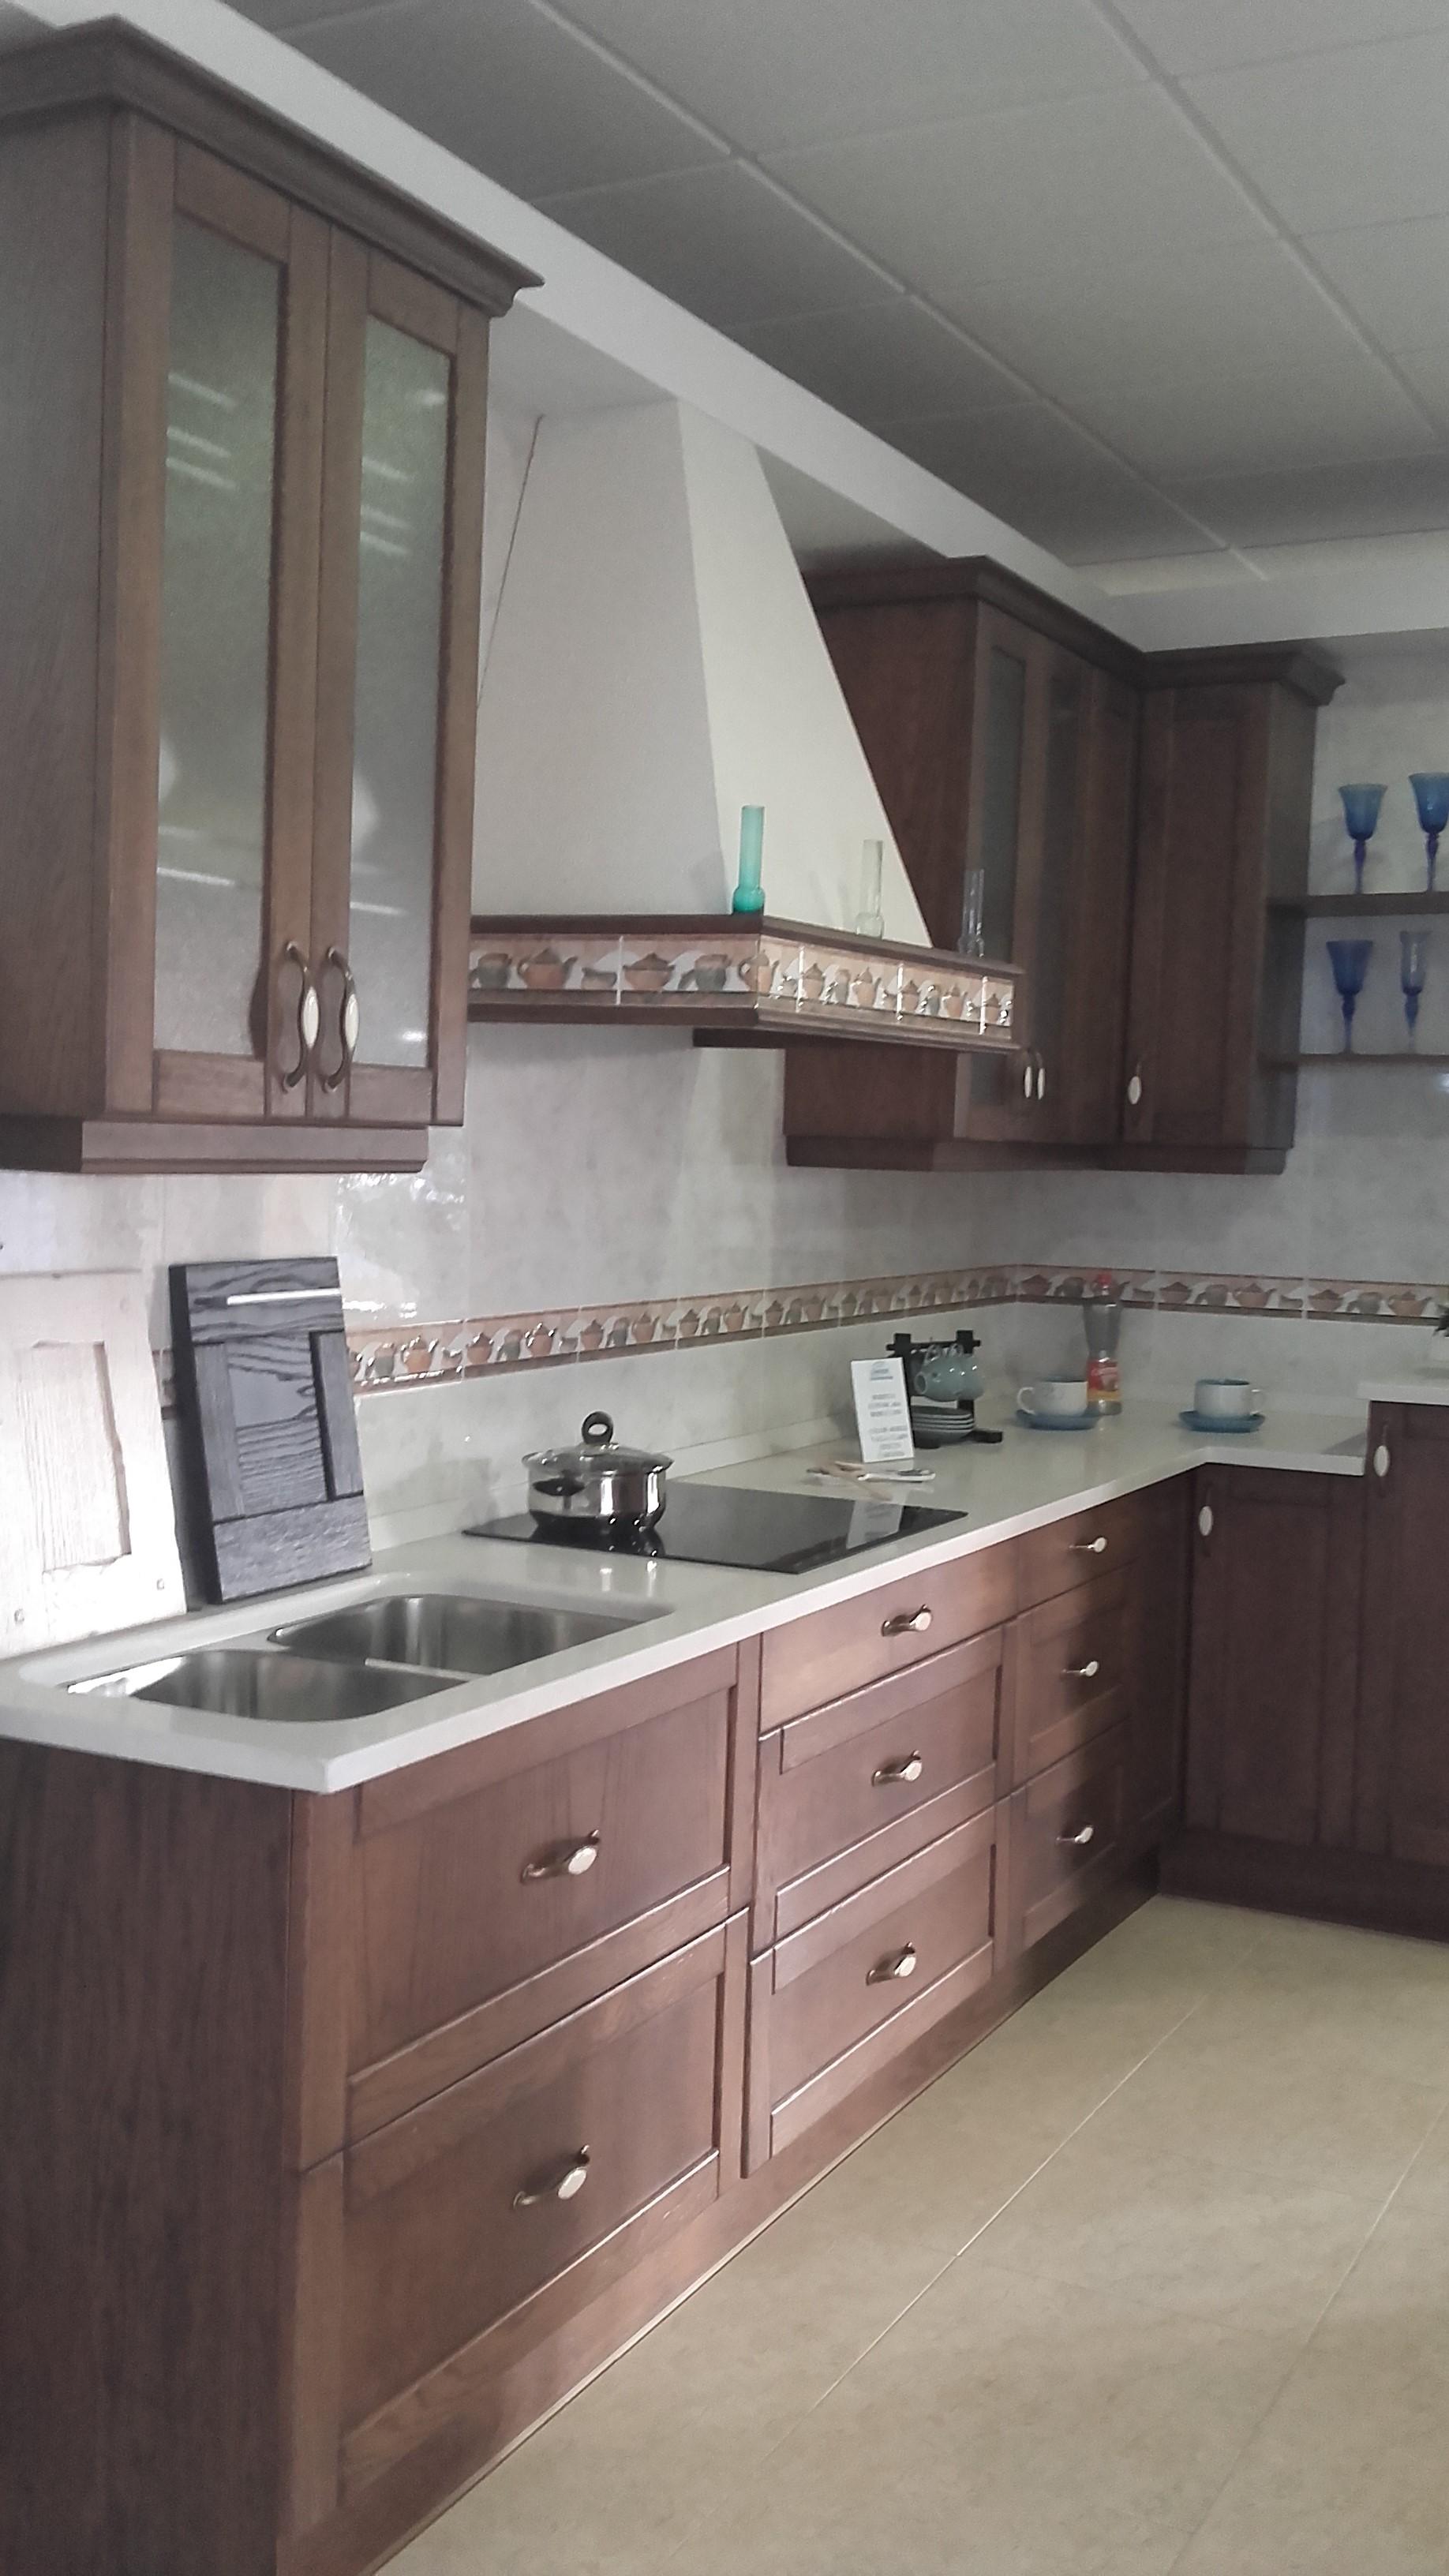 Muebles de cocina Cosamba 2000 - Polan - Carretera Navalpino ...